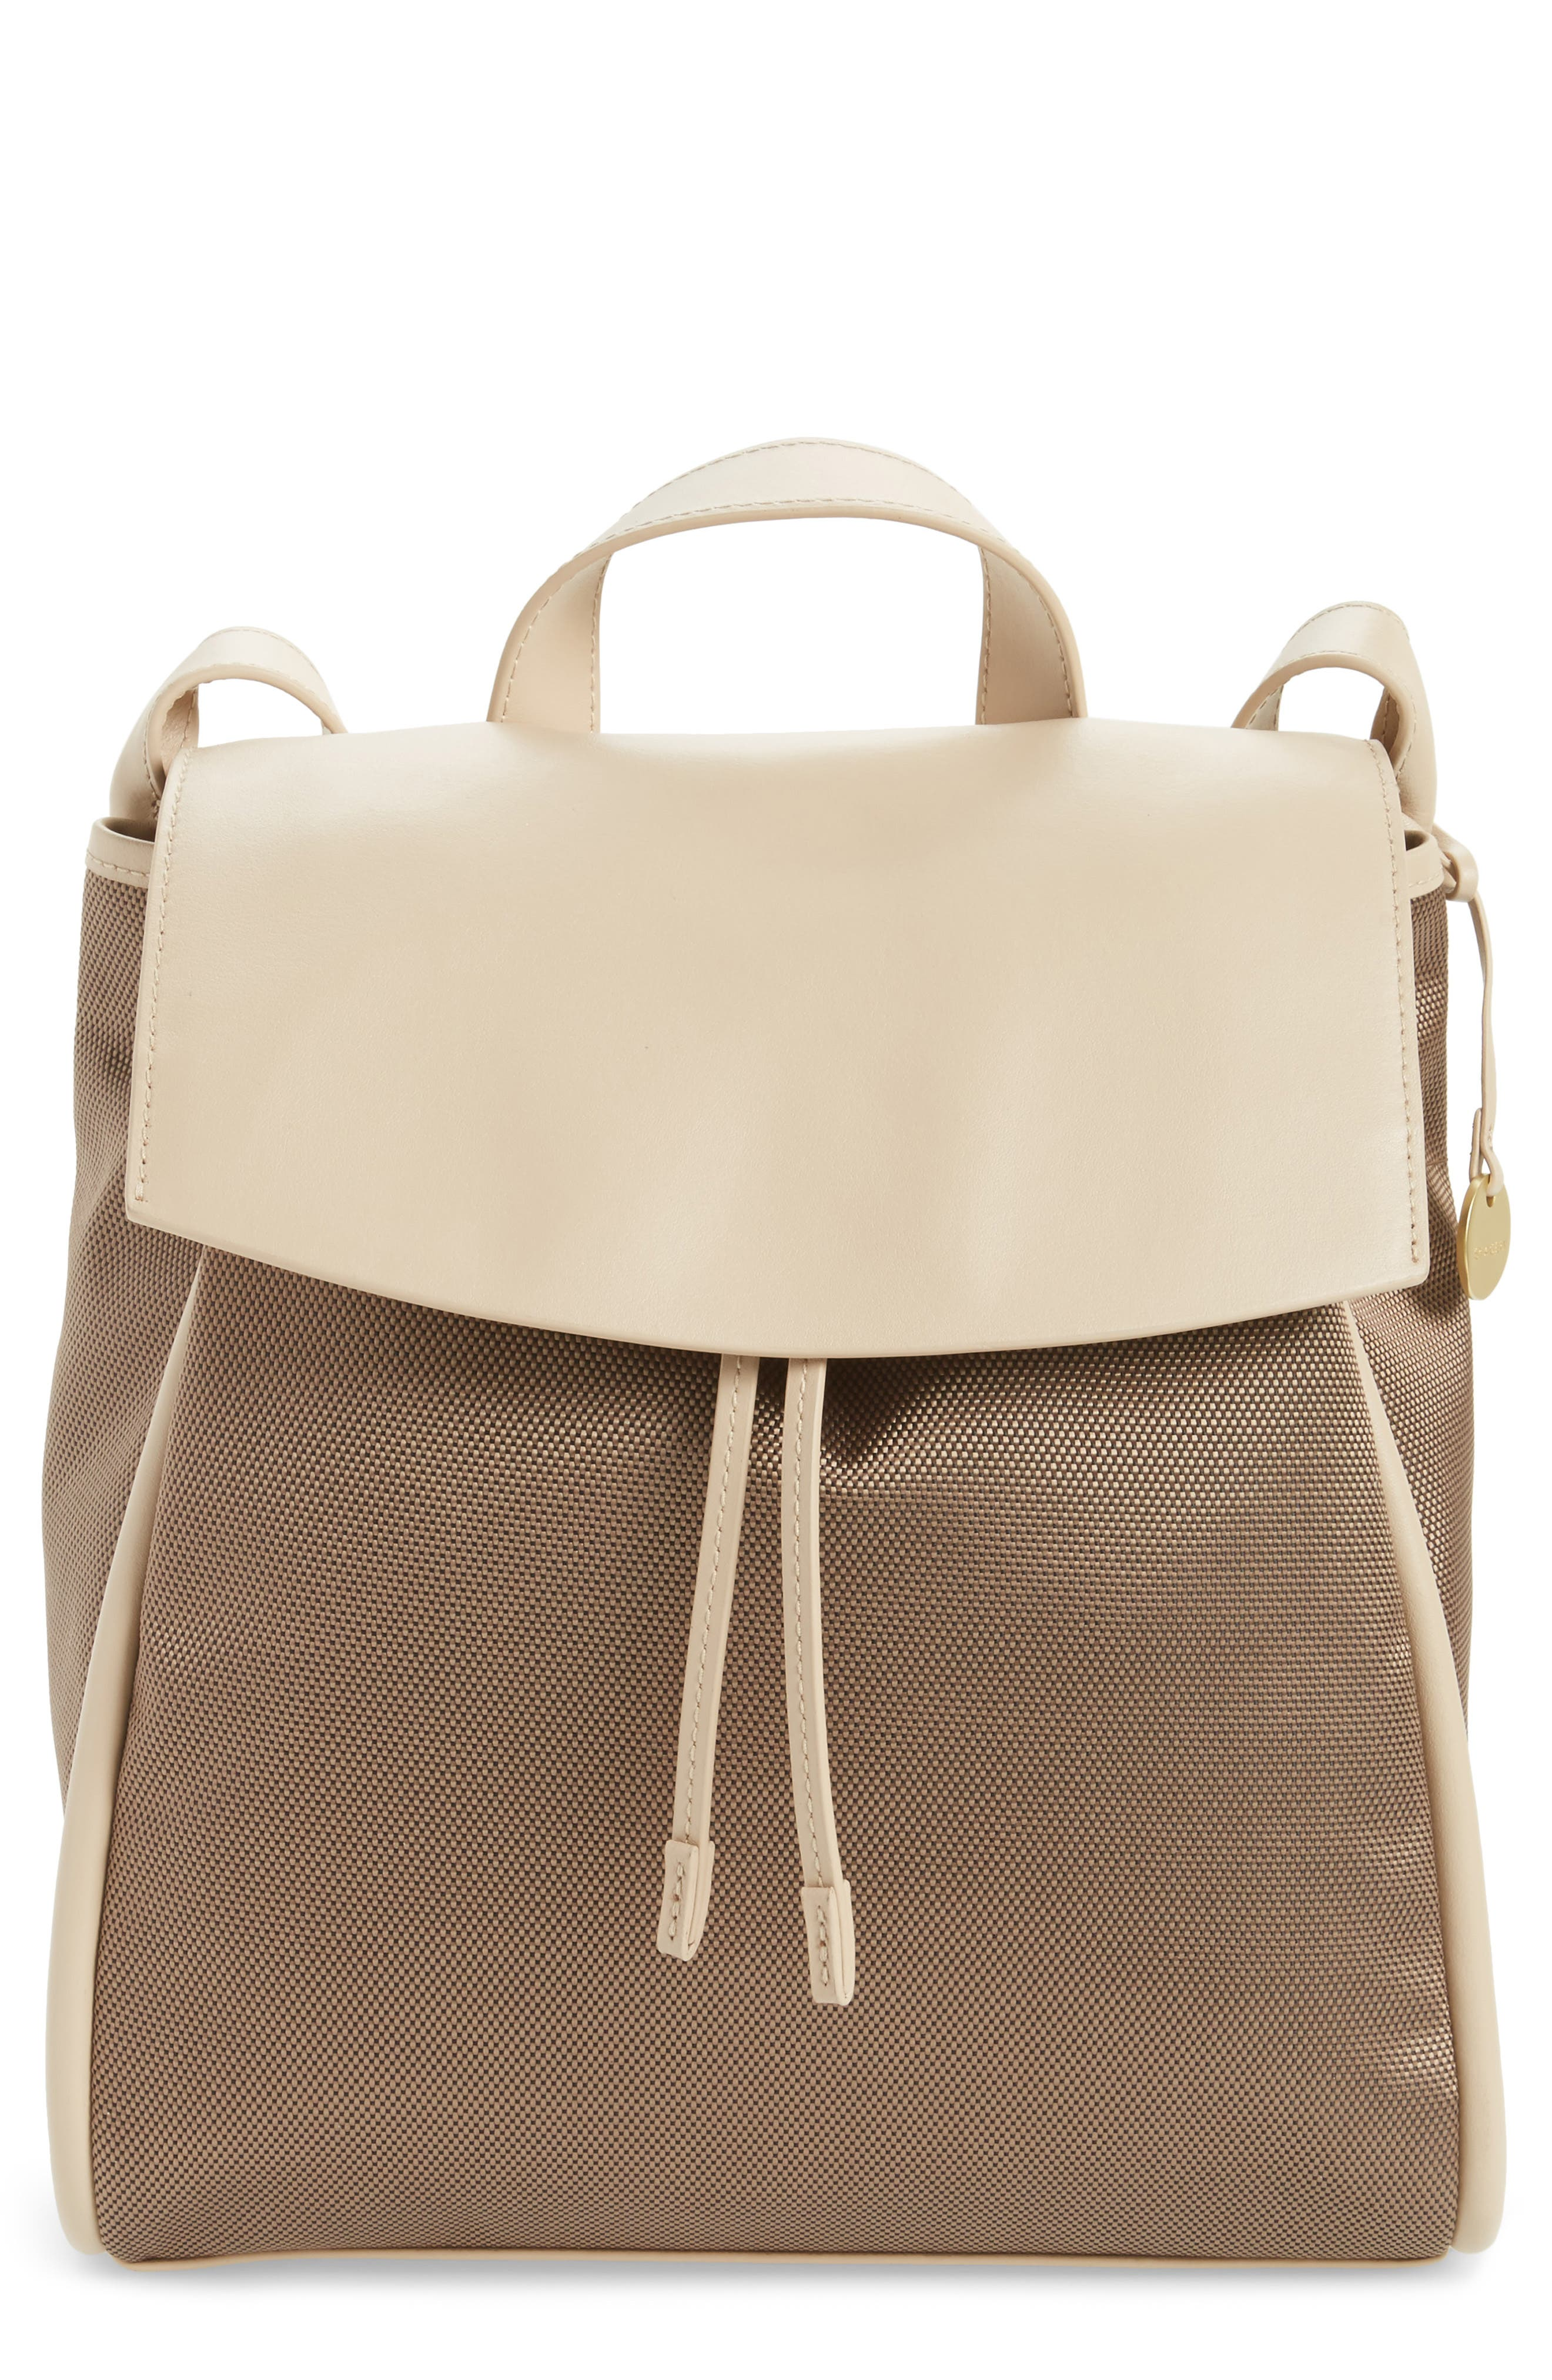 Alternate Image 1 Selected - Skagen Ebba Leather & Canvas Backpack